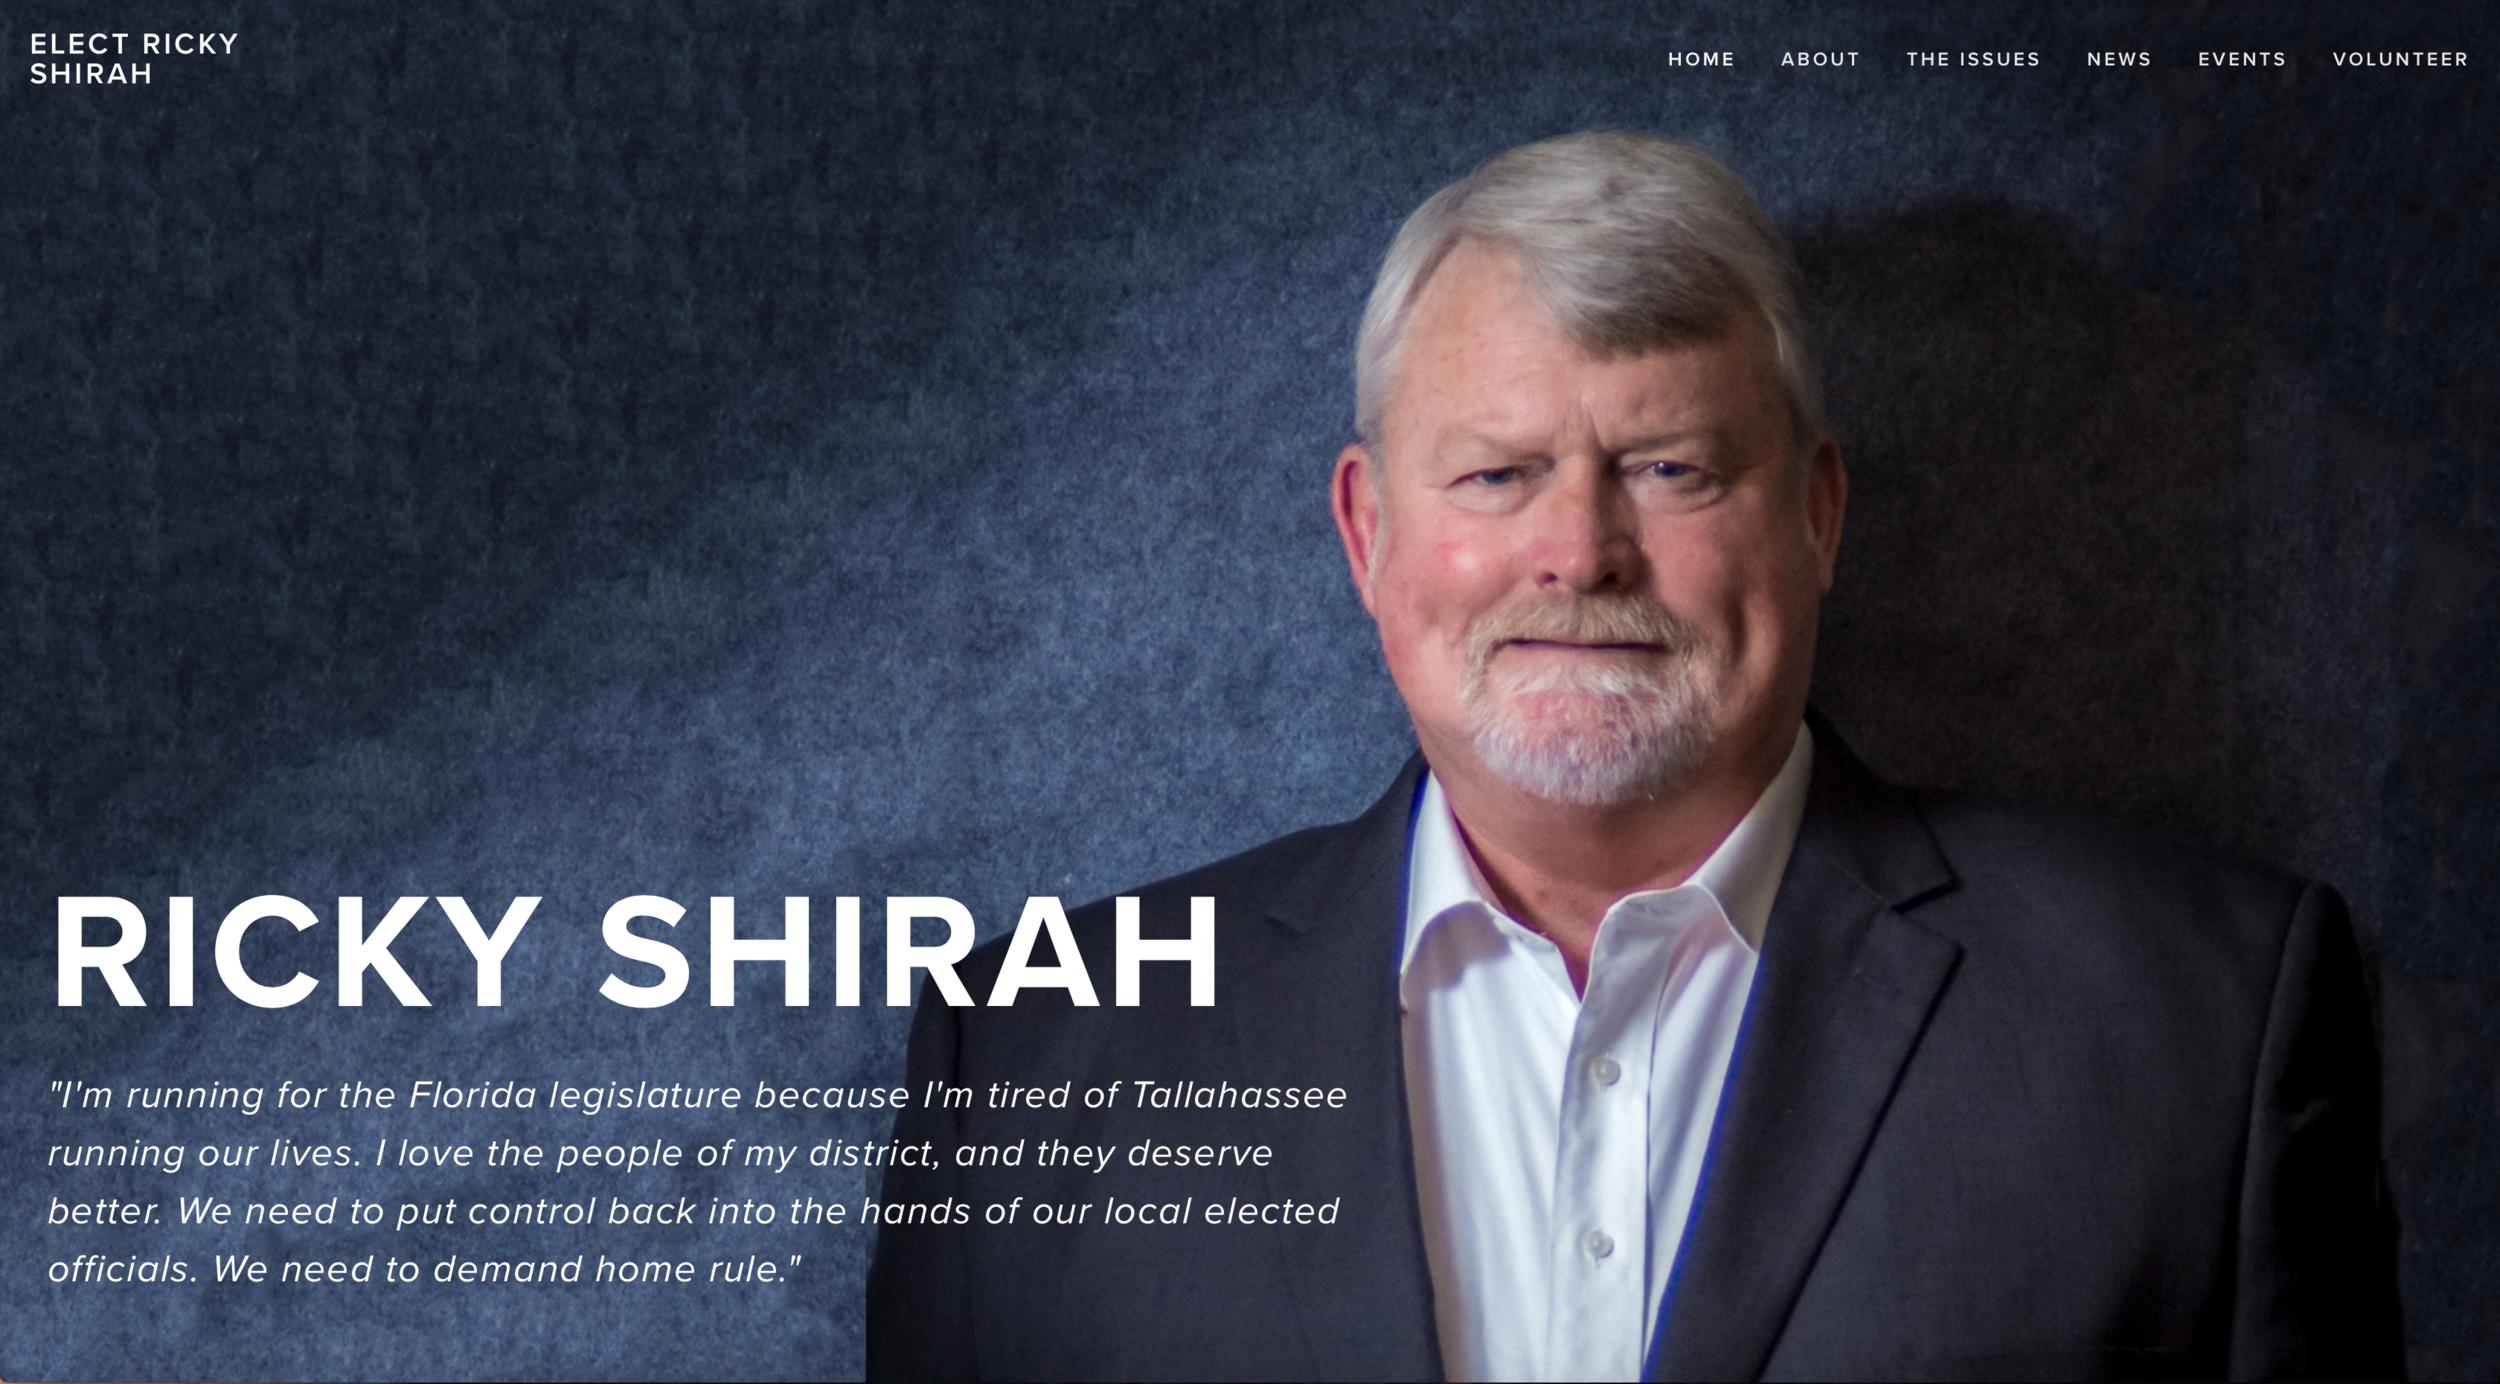 Ricky Shirah for Florida state legislature's homepage.